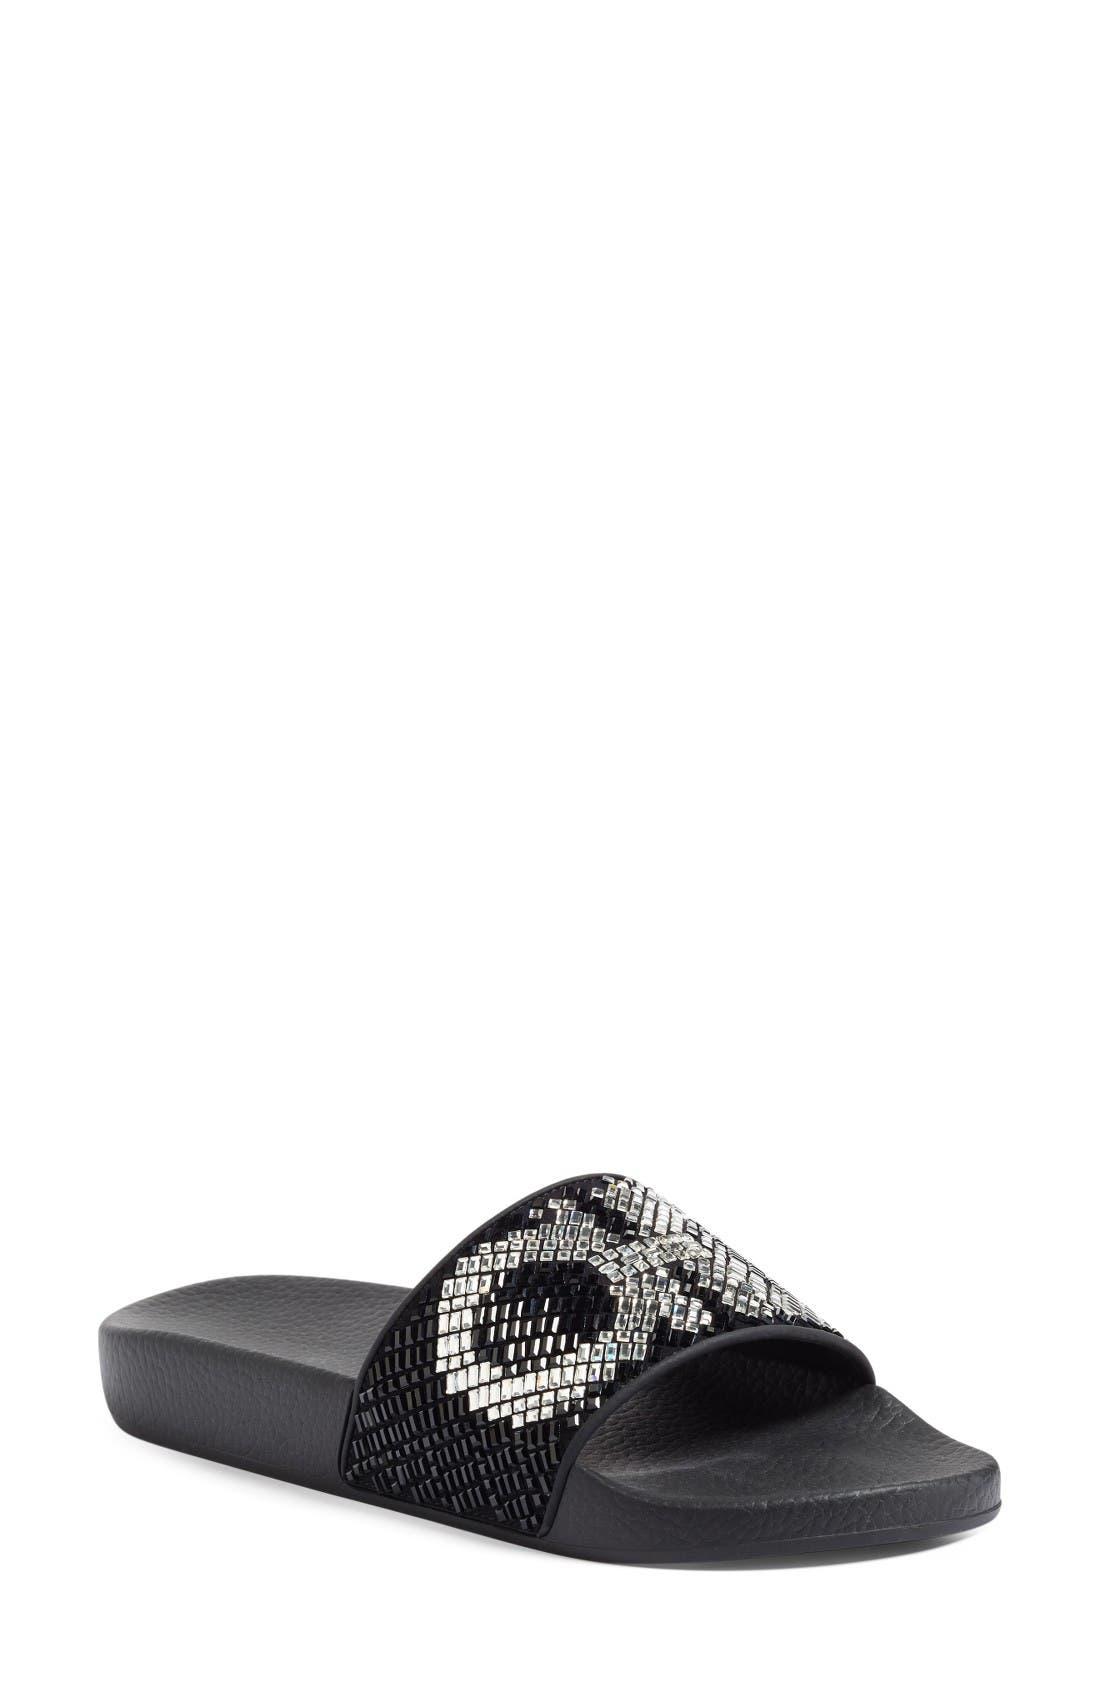 Main Image - Salvatore Ferragamo Crystal Logo Slide Sandal (Women)